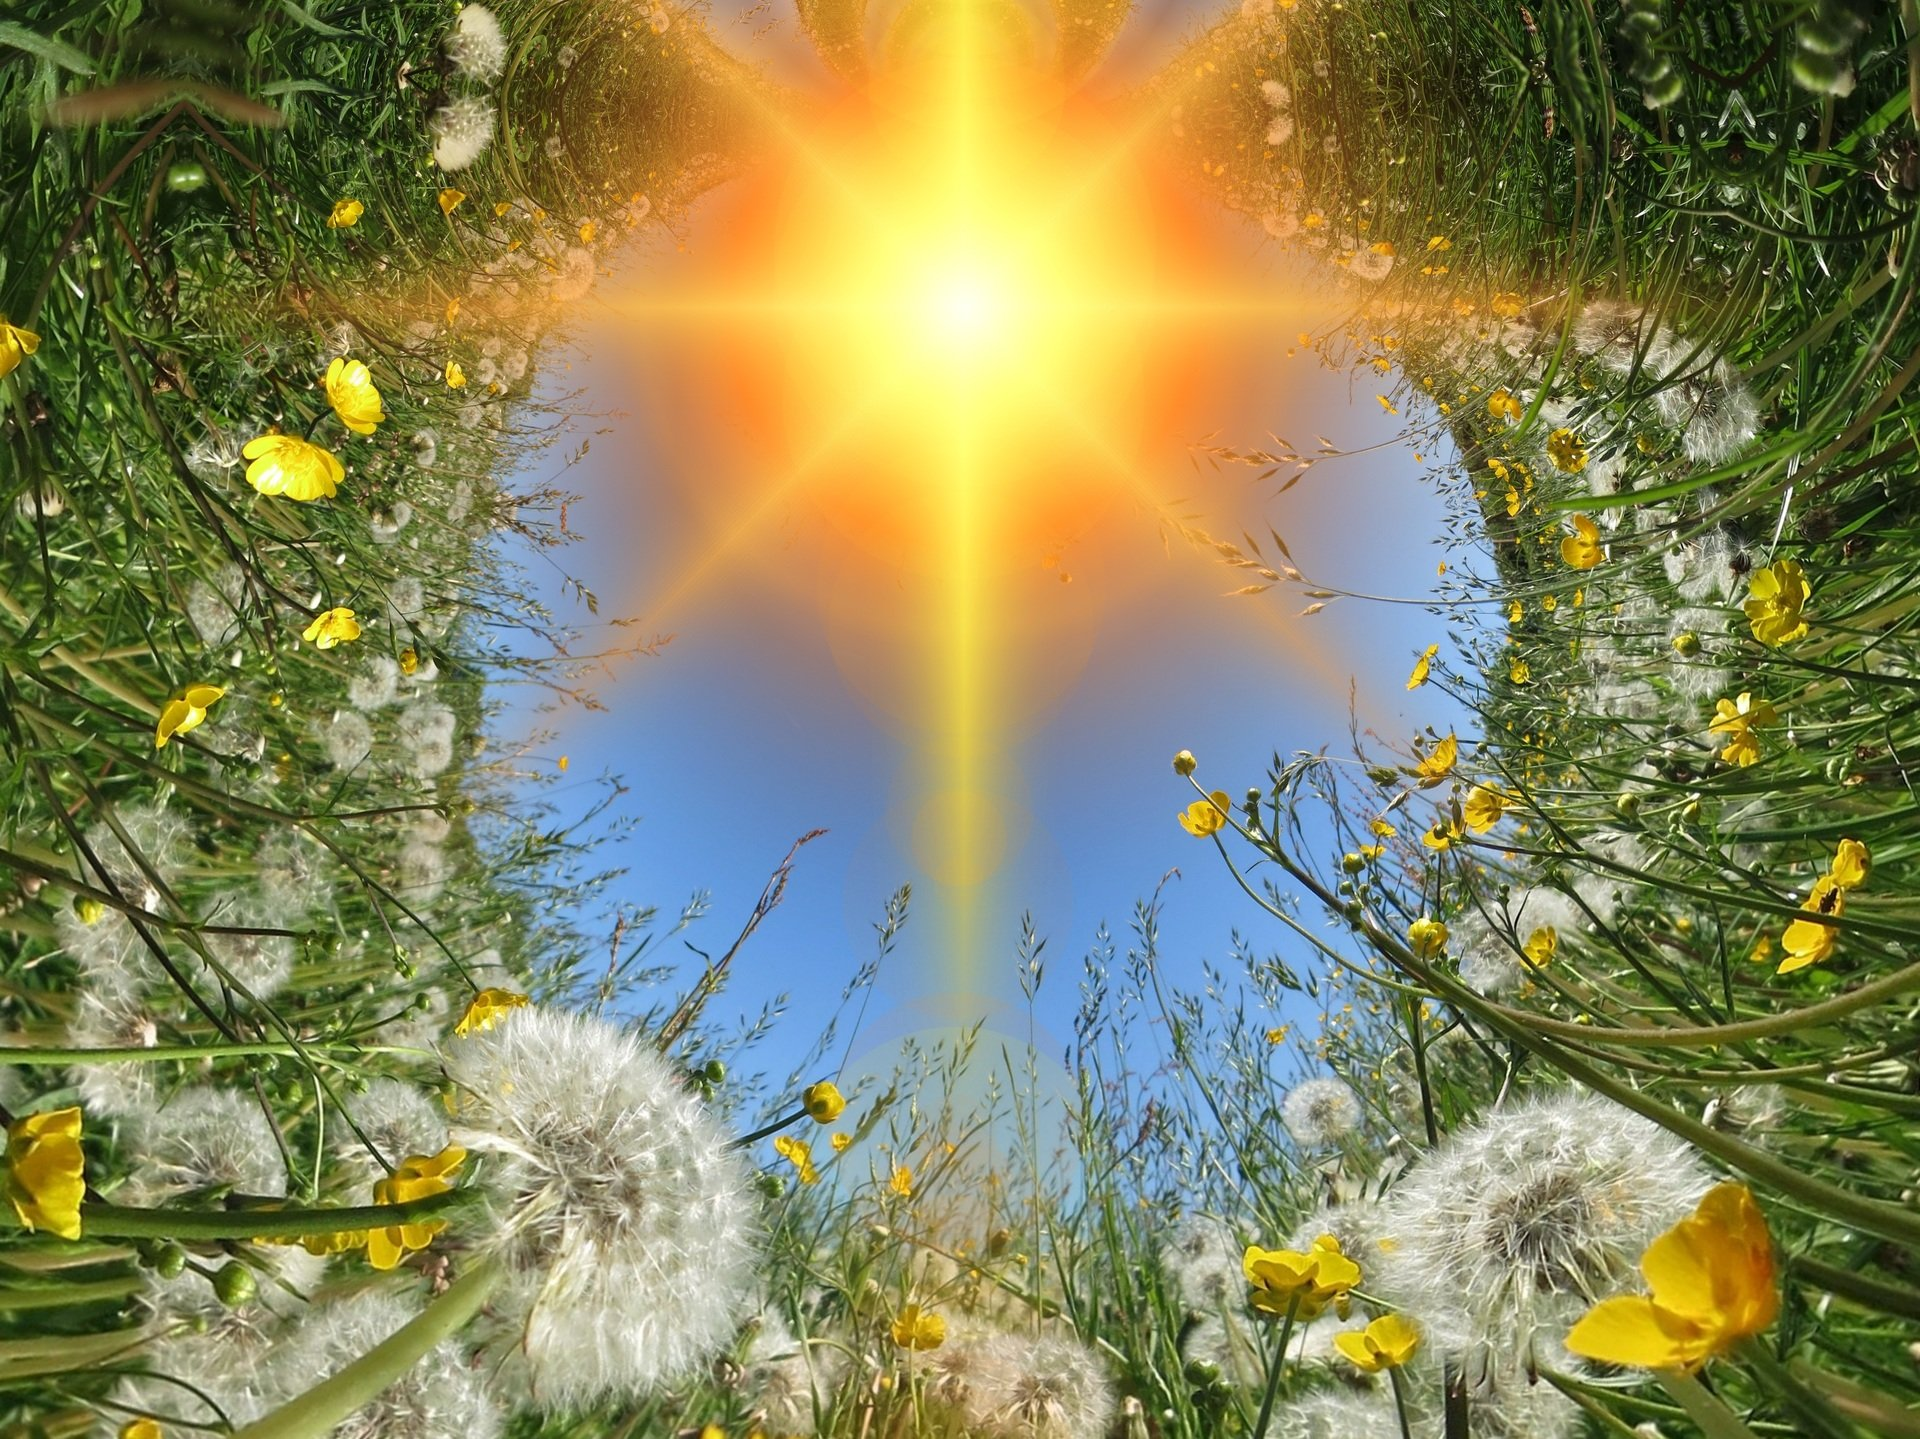 Картинки с солнышком фото